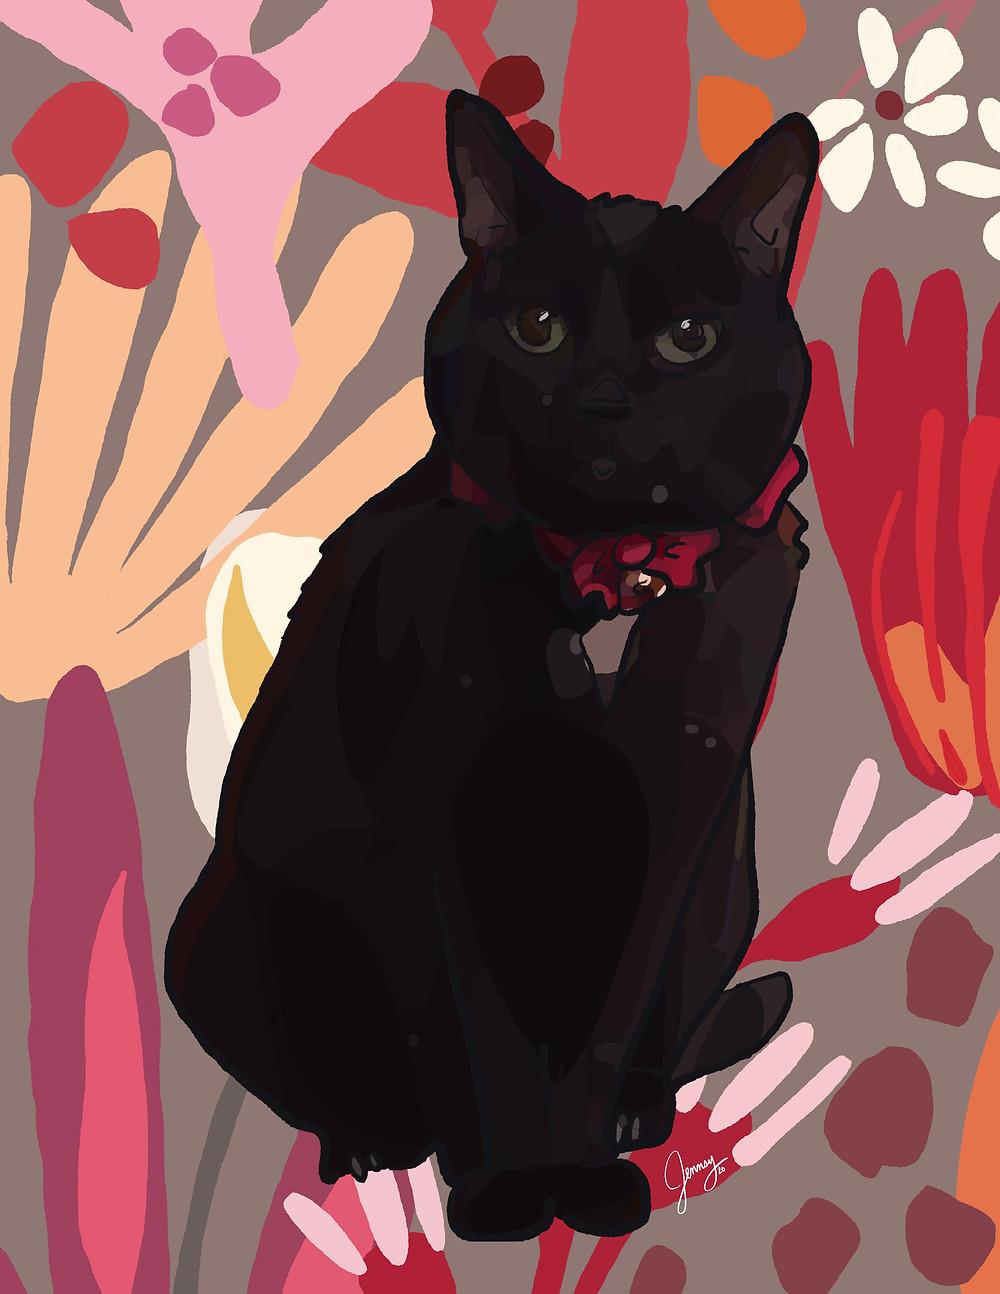 Final pet portrait of black cat drawn on iPad with Procreate